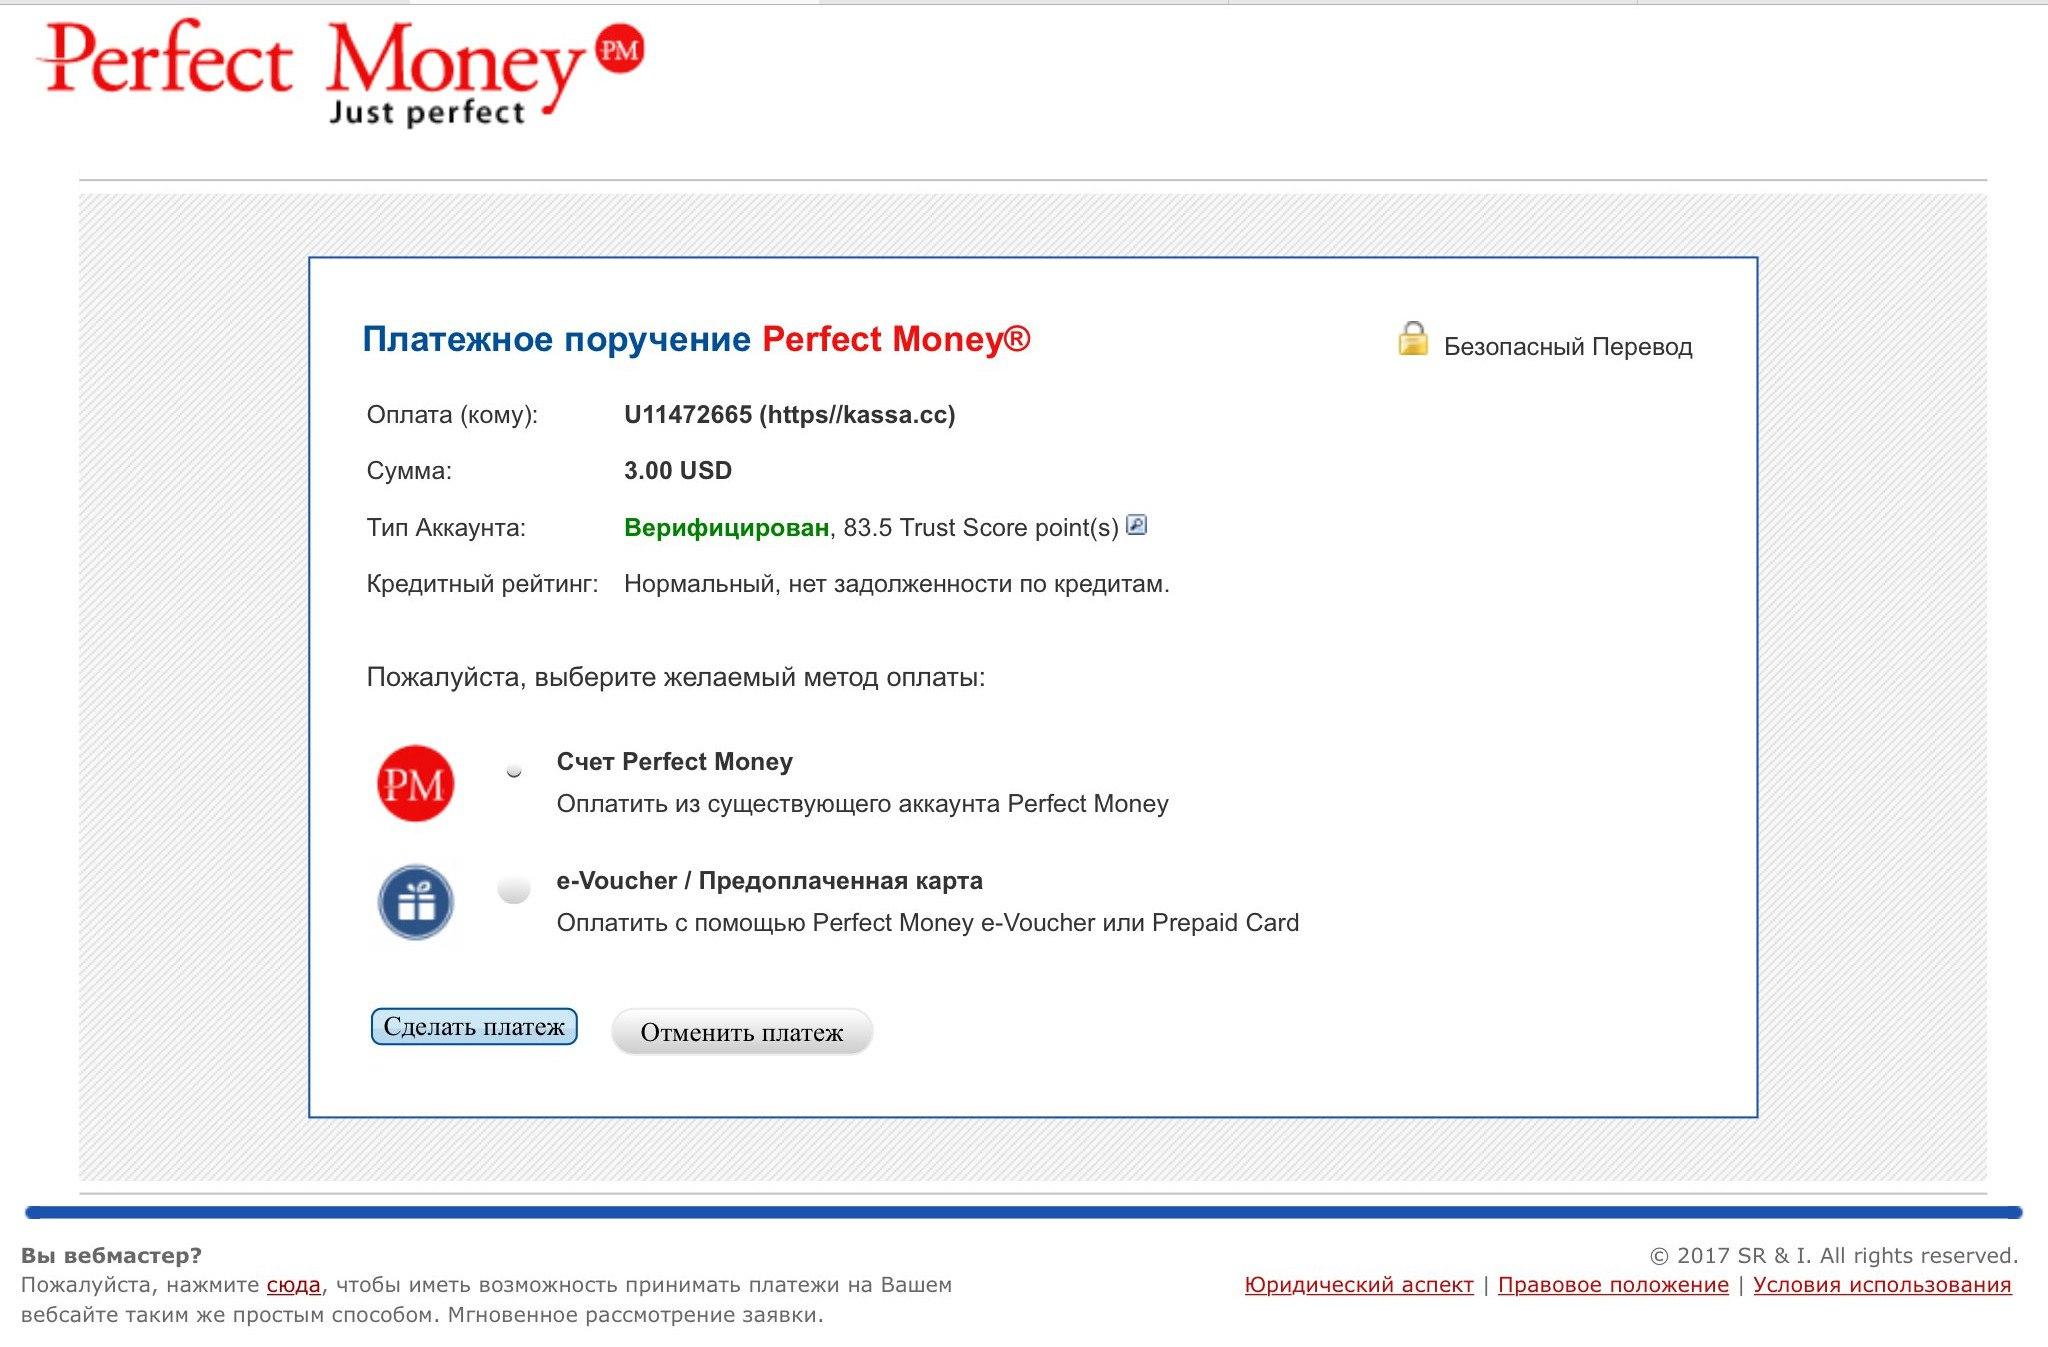 Kassa.cc - единый обмен валюты. Обмен Perfect Money USD на BTC-e RUB